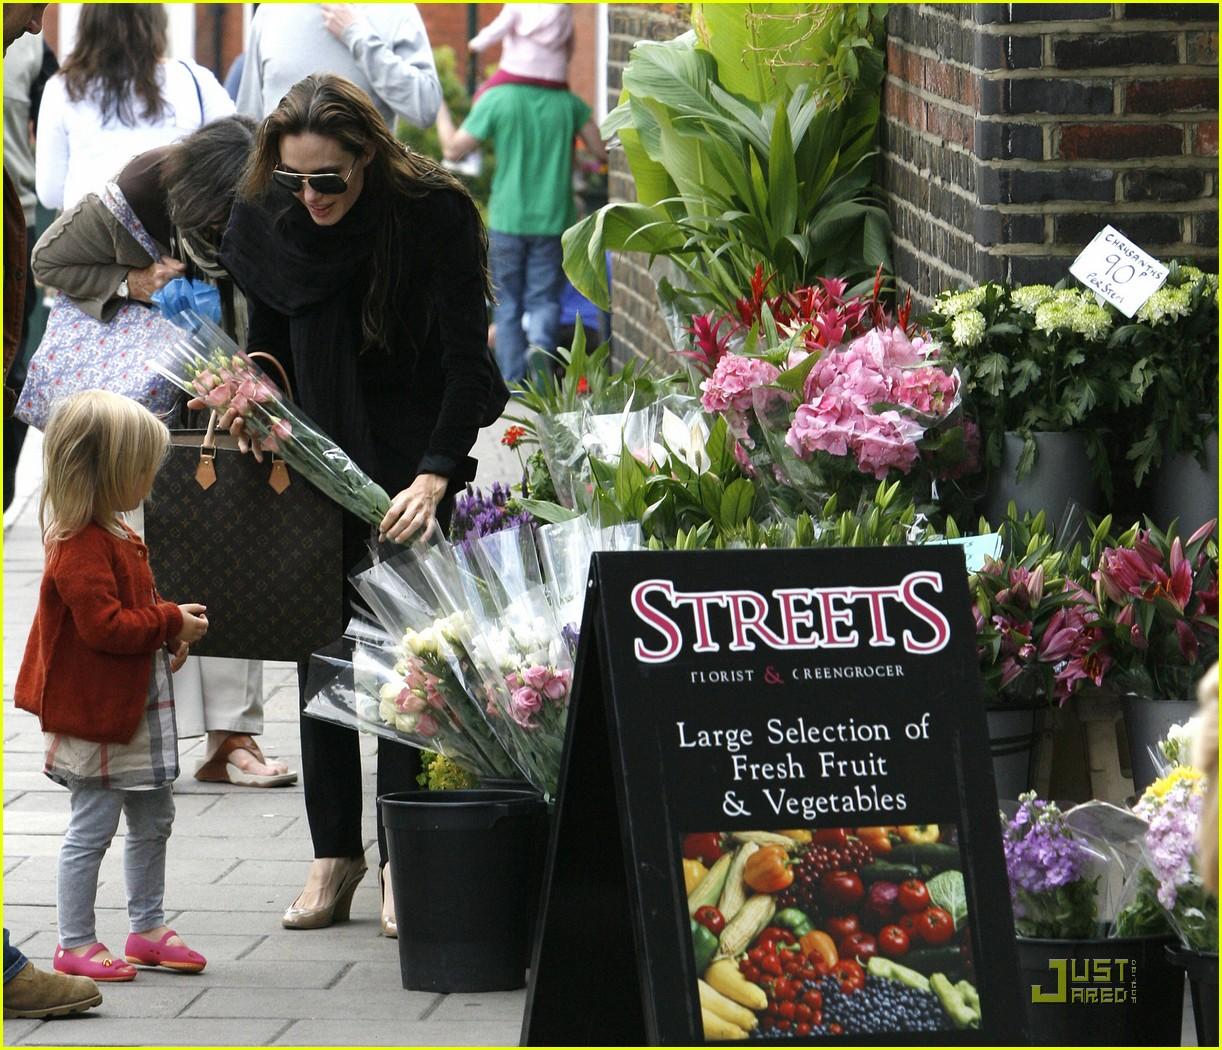 http://2.bp.blogspot.com/-4xoHzFWO-cg/TirMYZ5Y_1I/AAAAAAAAAqU/IRPU2wEziDU/s1600/angelina-jolie-vivienne-flowers-03.JPG